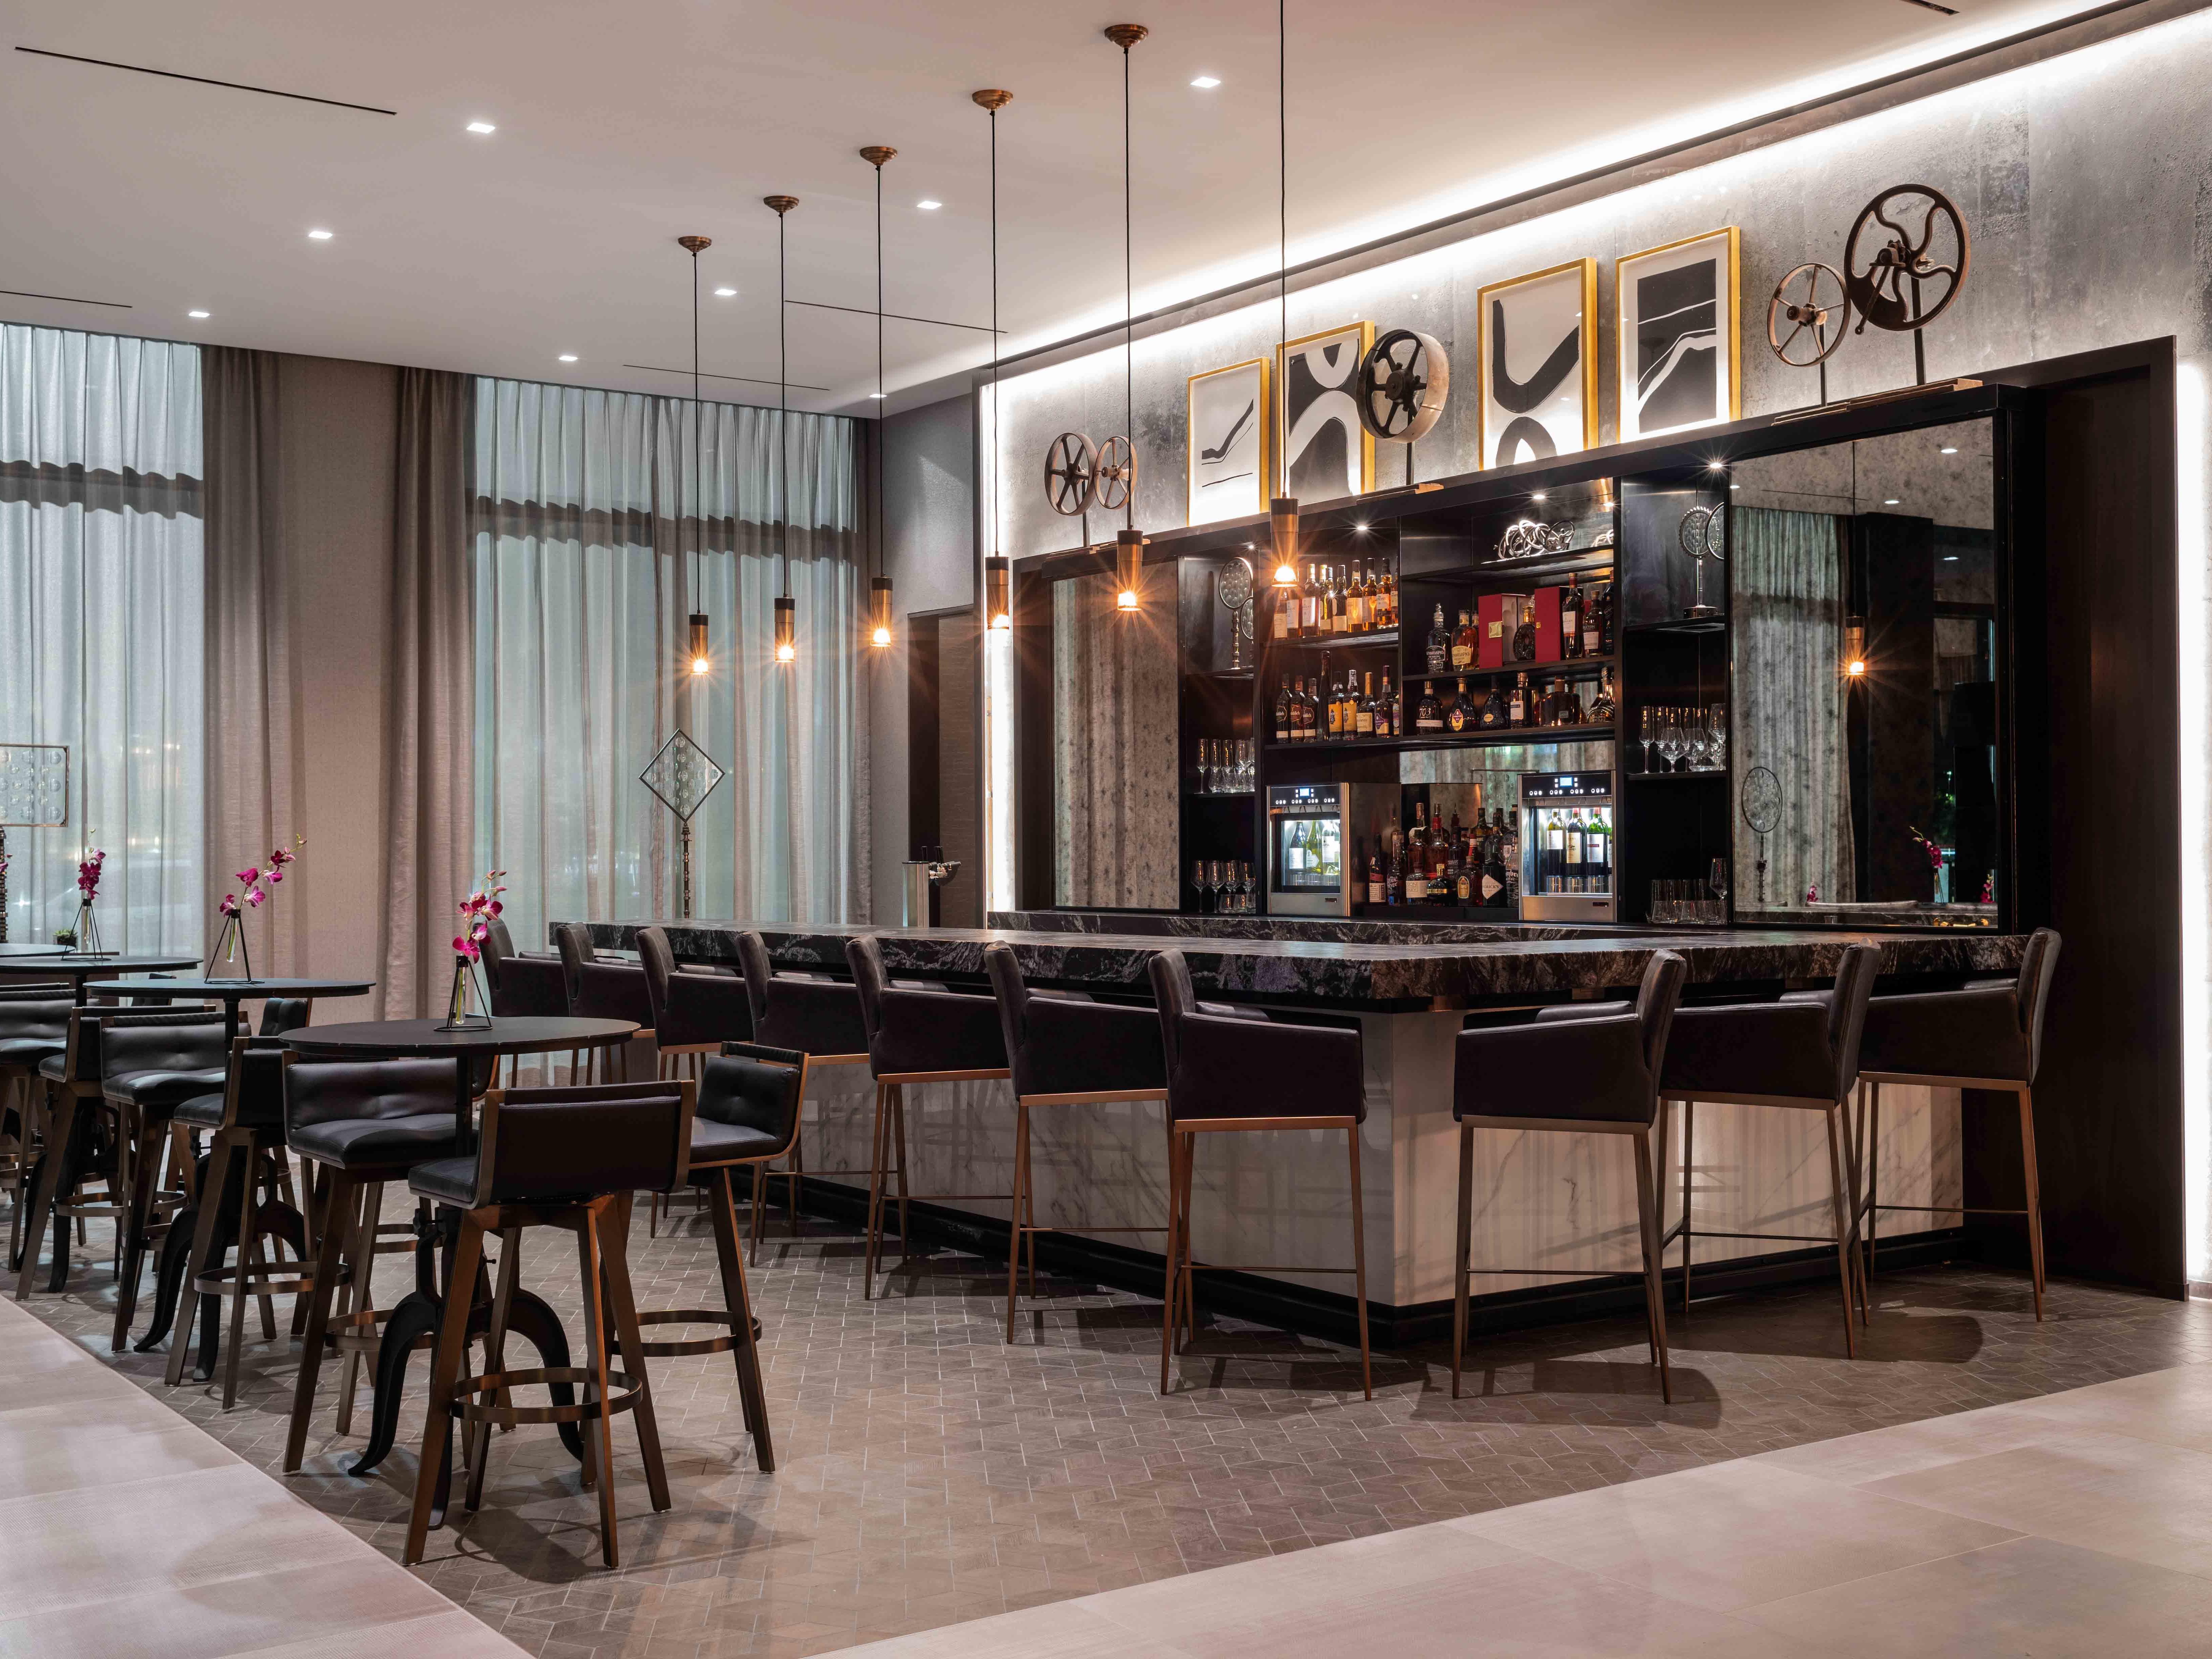 Reflections - Lobby Lounge & Bar